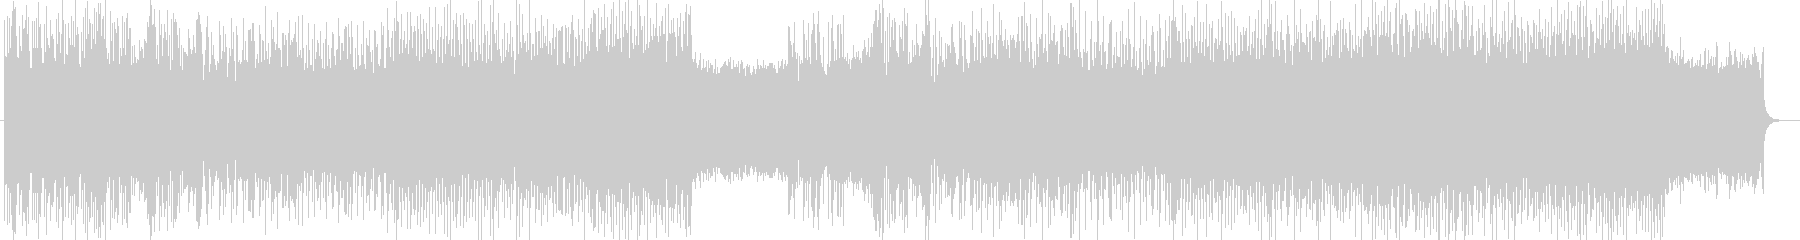 「HR/HM」「DARK」BGM266の未再生の波形